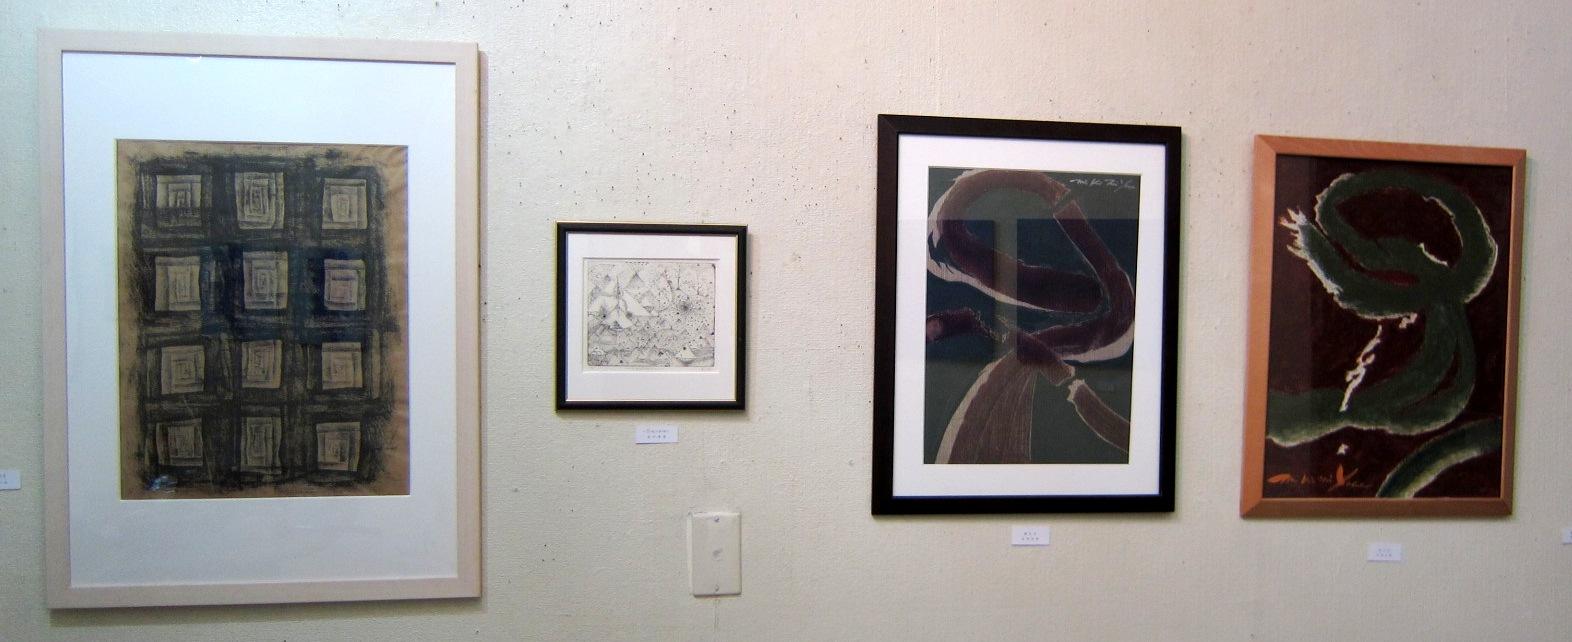 2354) 「LA`TAPIO -Ⅱ- Exhibition」 たぴお 1月27日(月)~2月15日(土)_f0126829_11165468.jpg